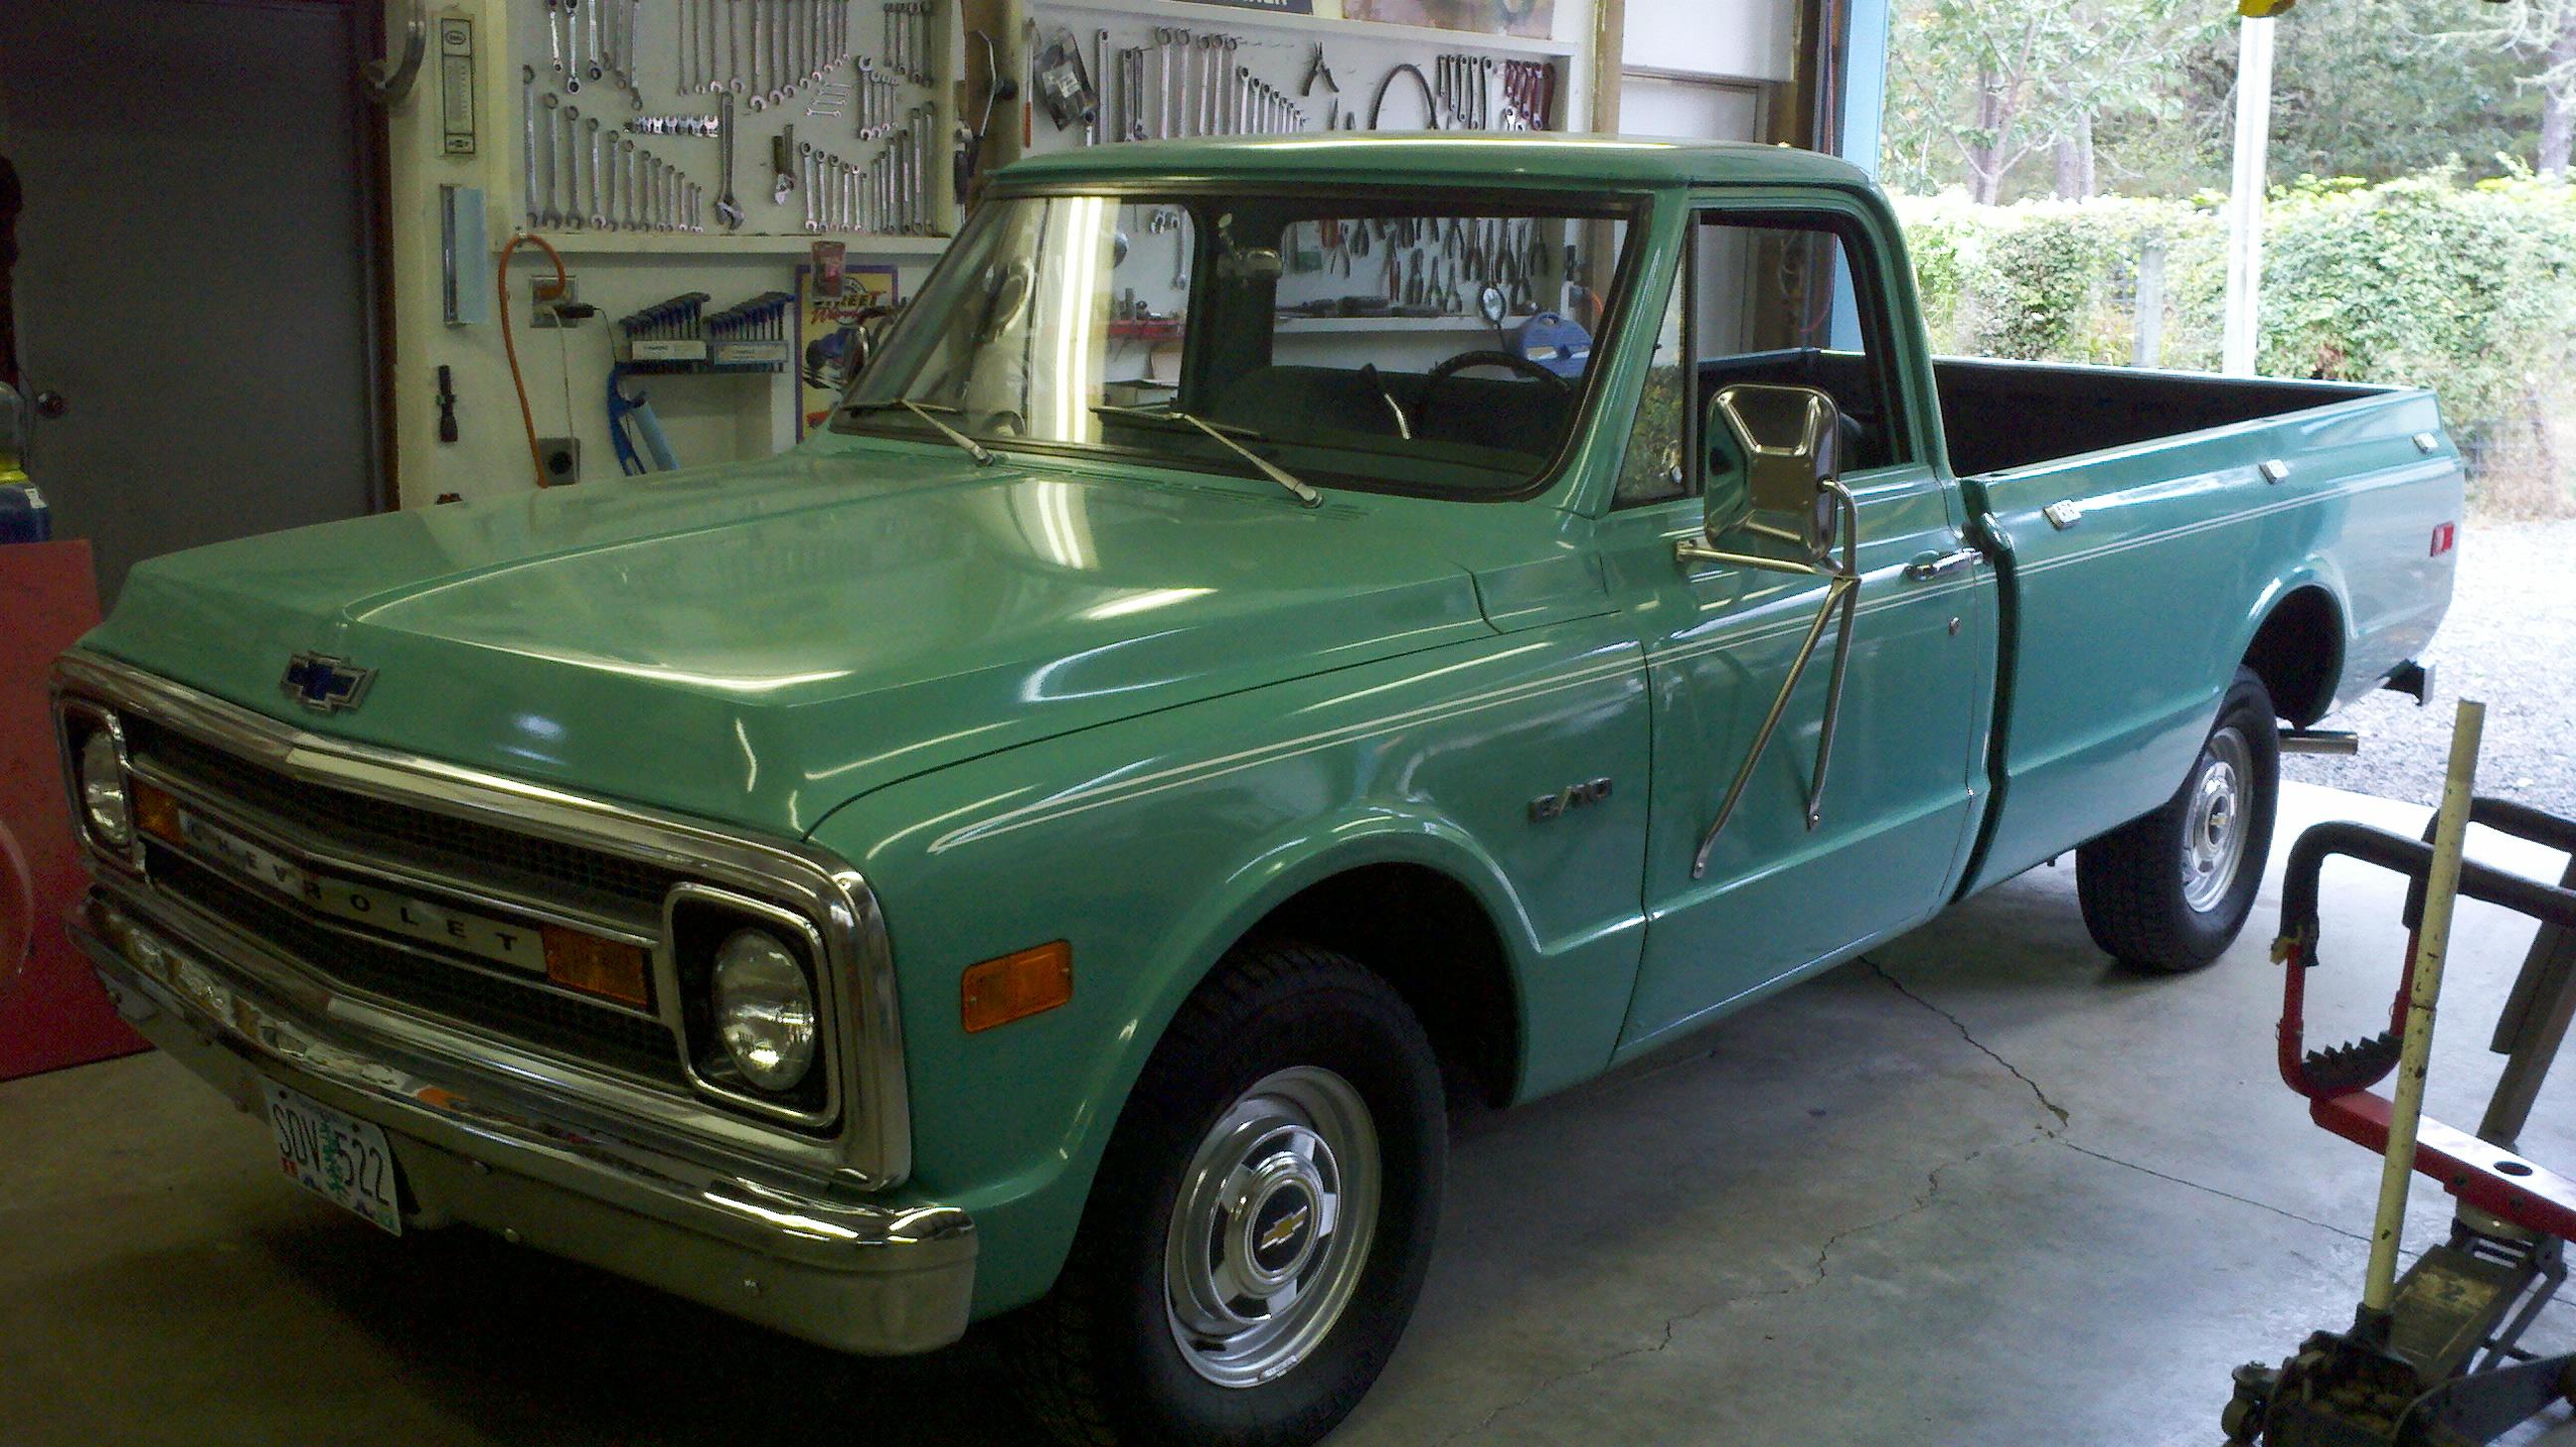 Sheridan Mock's 1969 Chevy Long/Wide Pickup